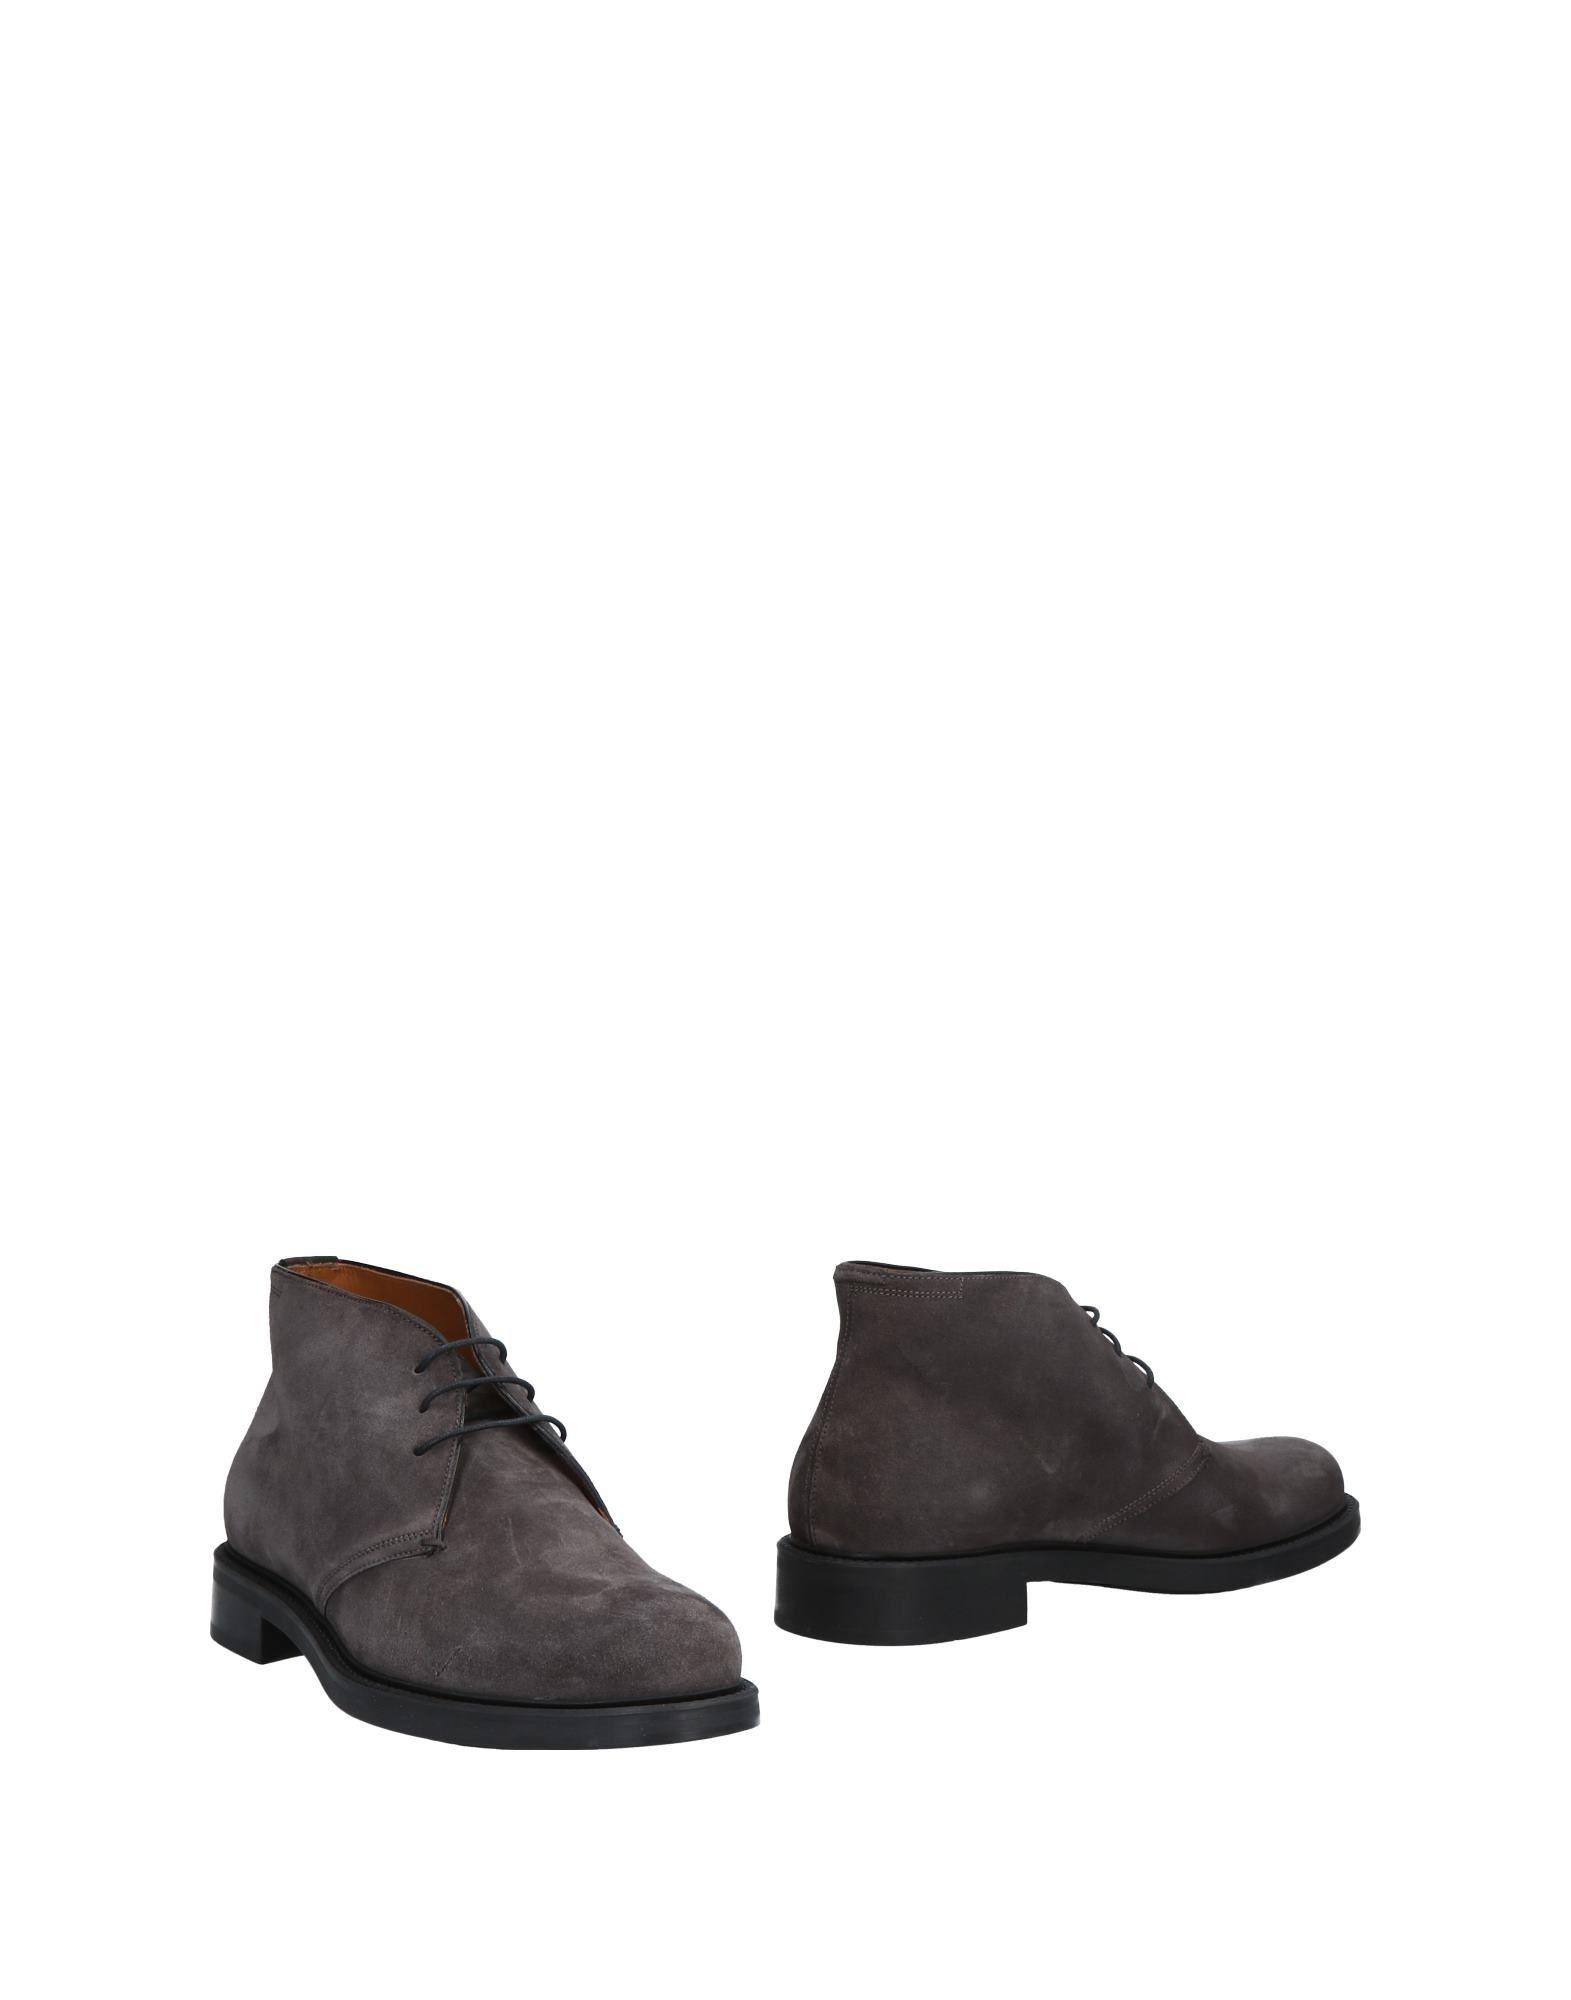 Rabatt echte Stiefelette Schuhe Triver Flight Stiefelette echte Herren  11481522PP 374018